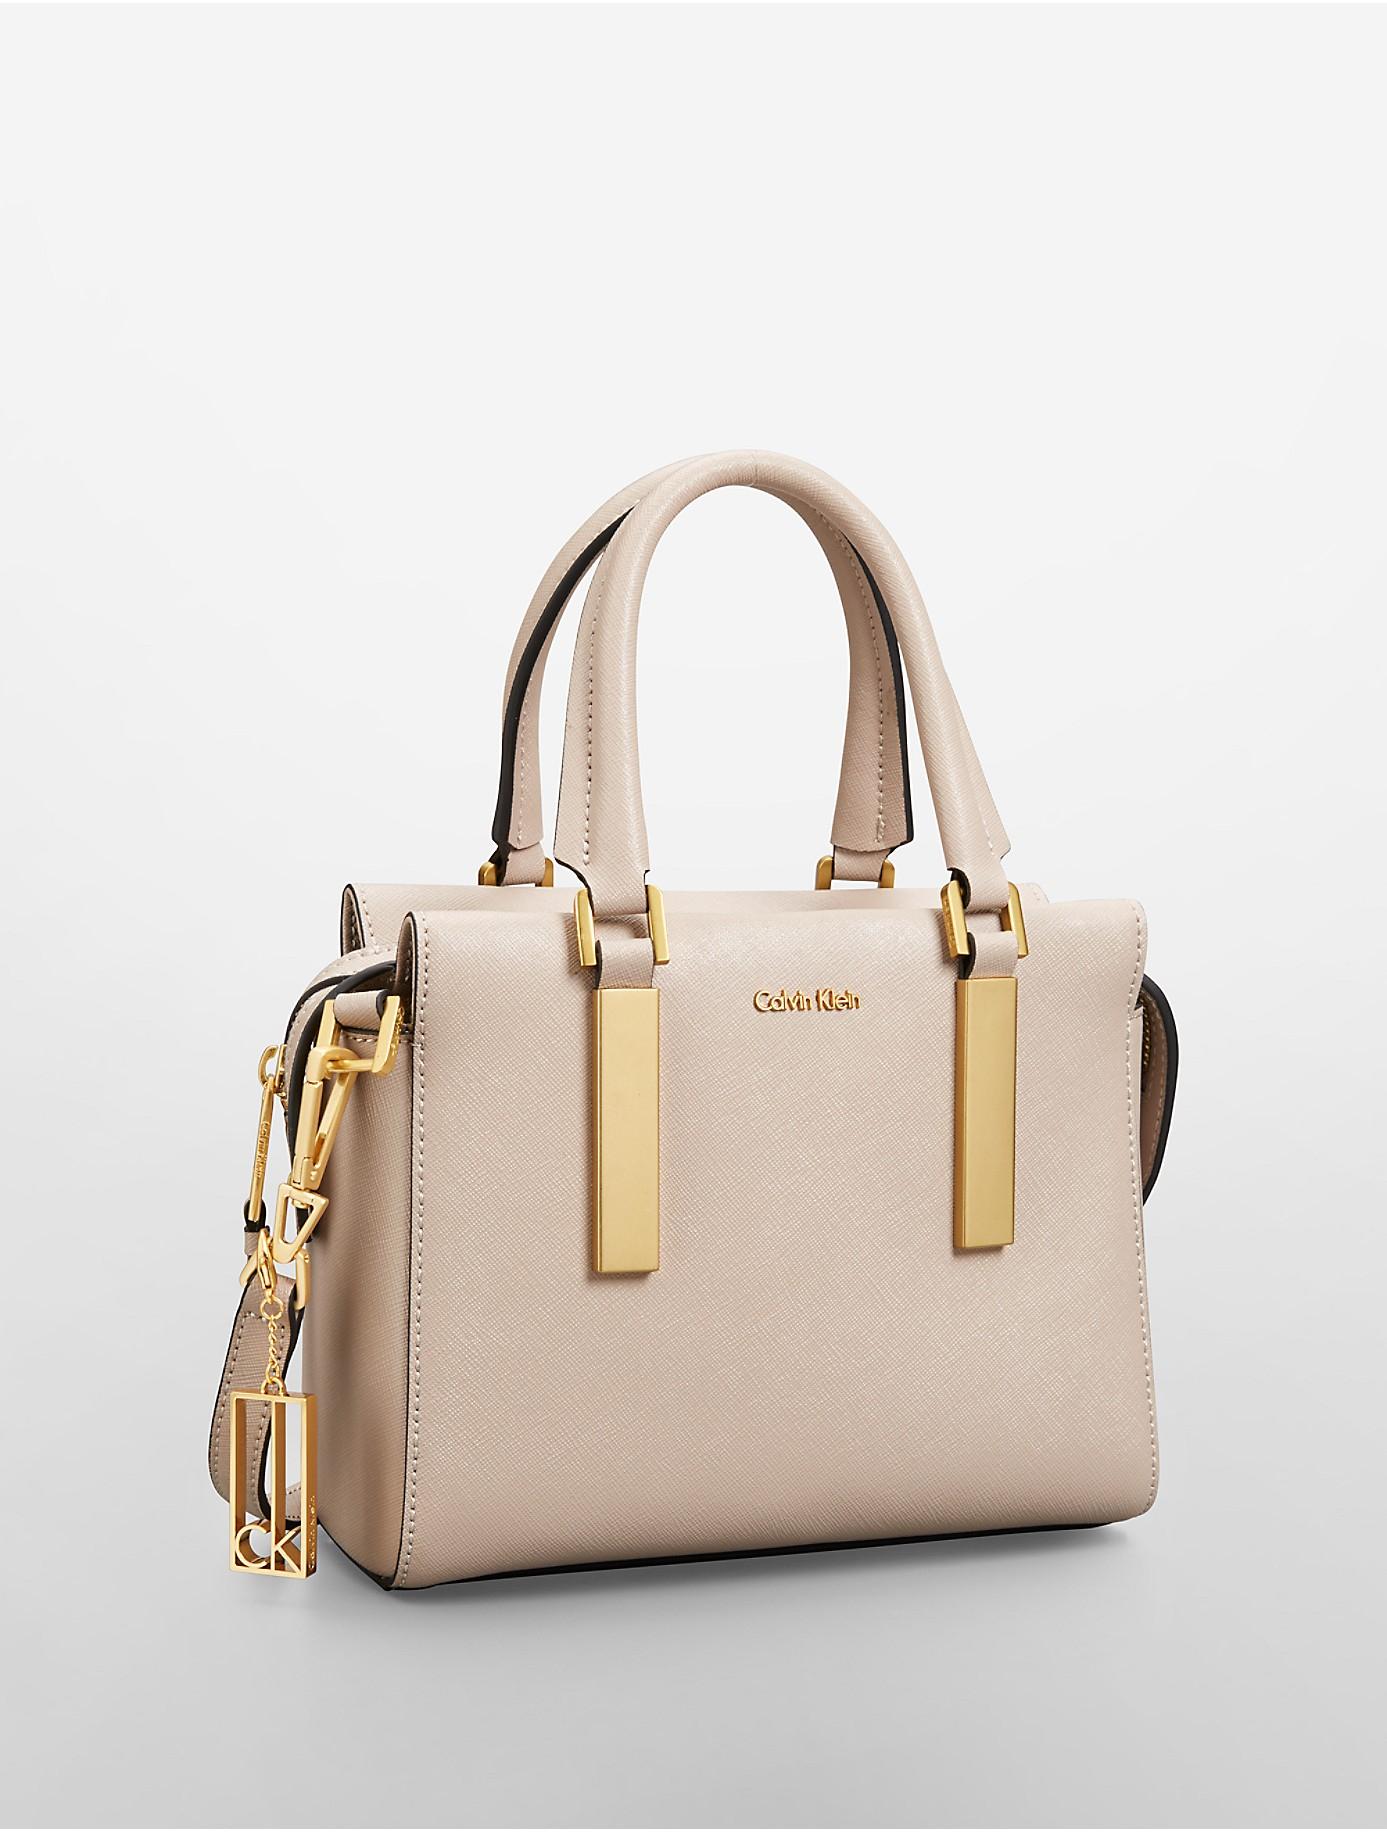 fd481c87acb Calvin Klein Handbag Exclusive Signature Tote Calvin Klein